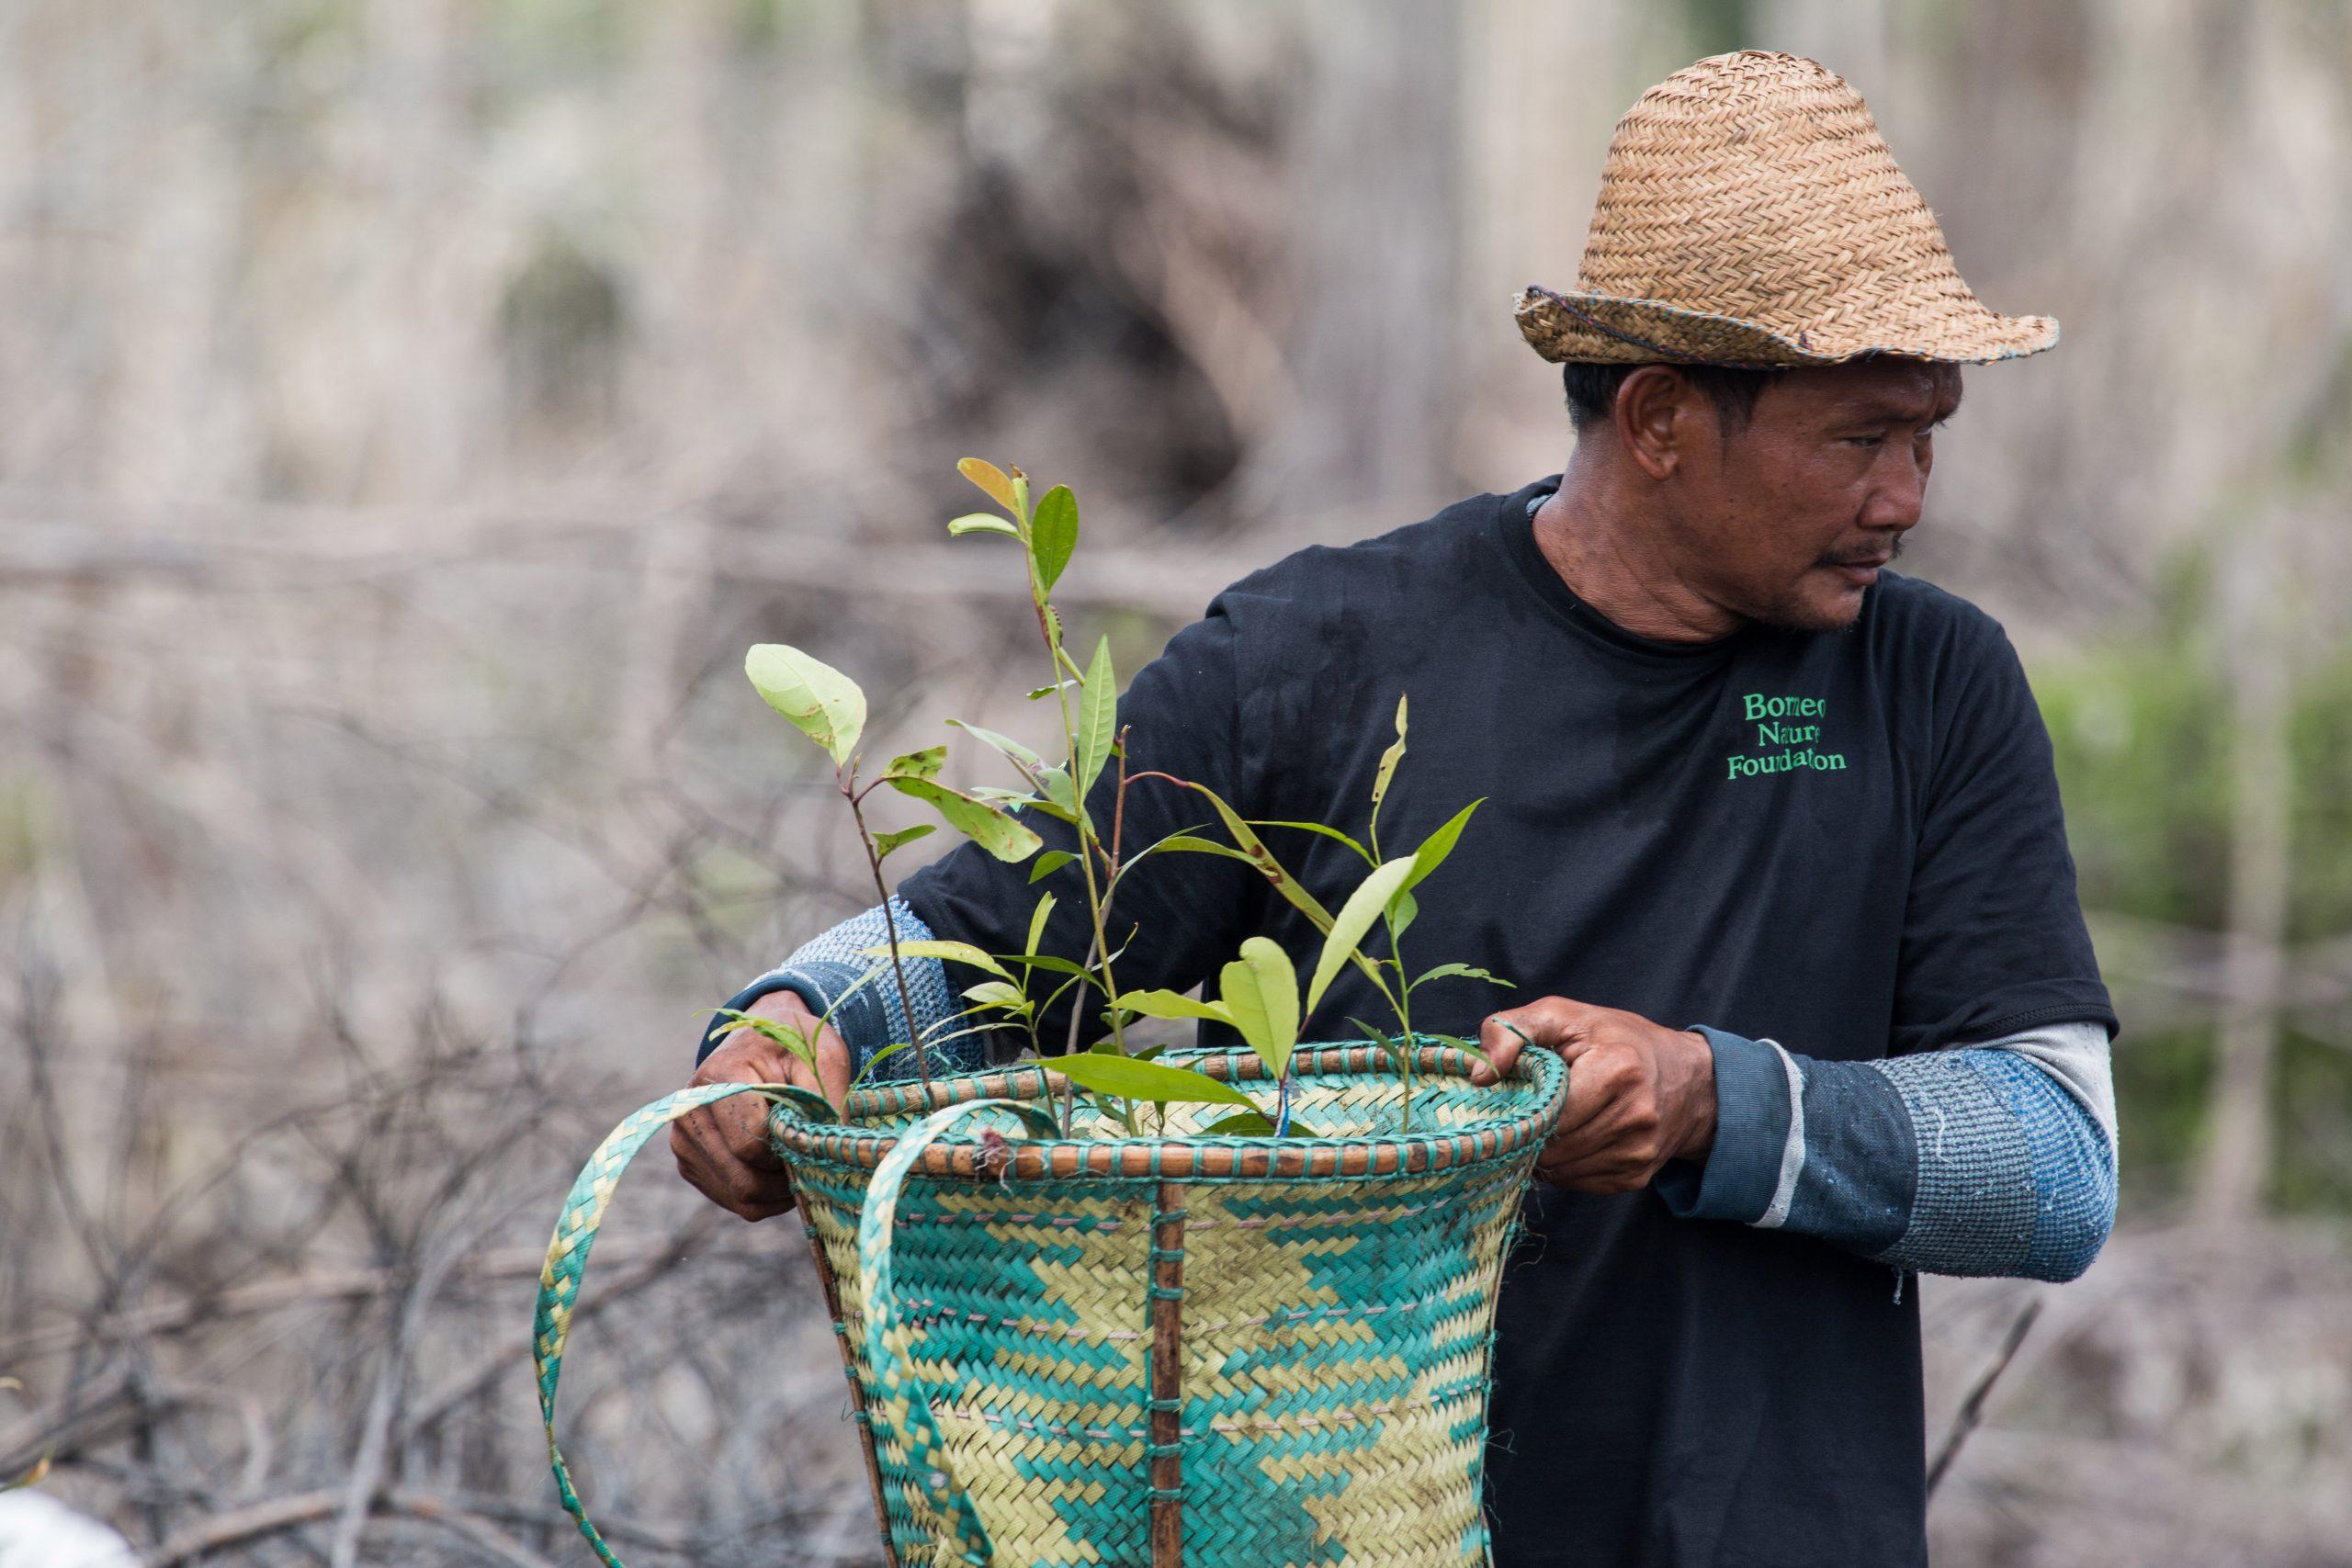 Planting October 2016-1-Sabangau-Pau Brugues Sintes lowress